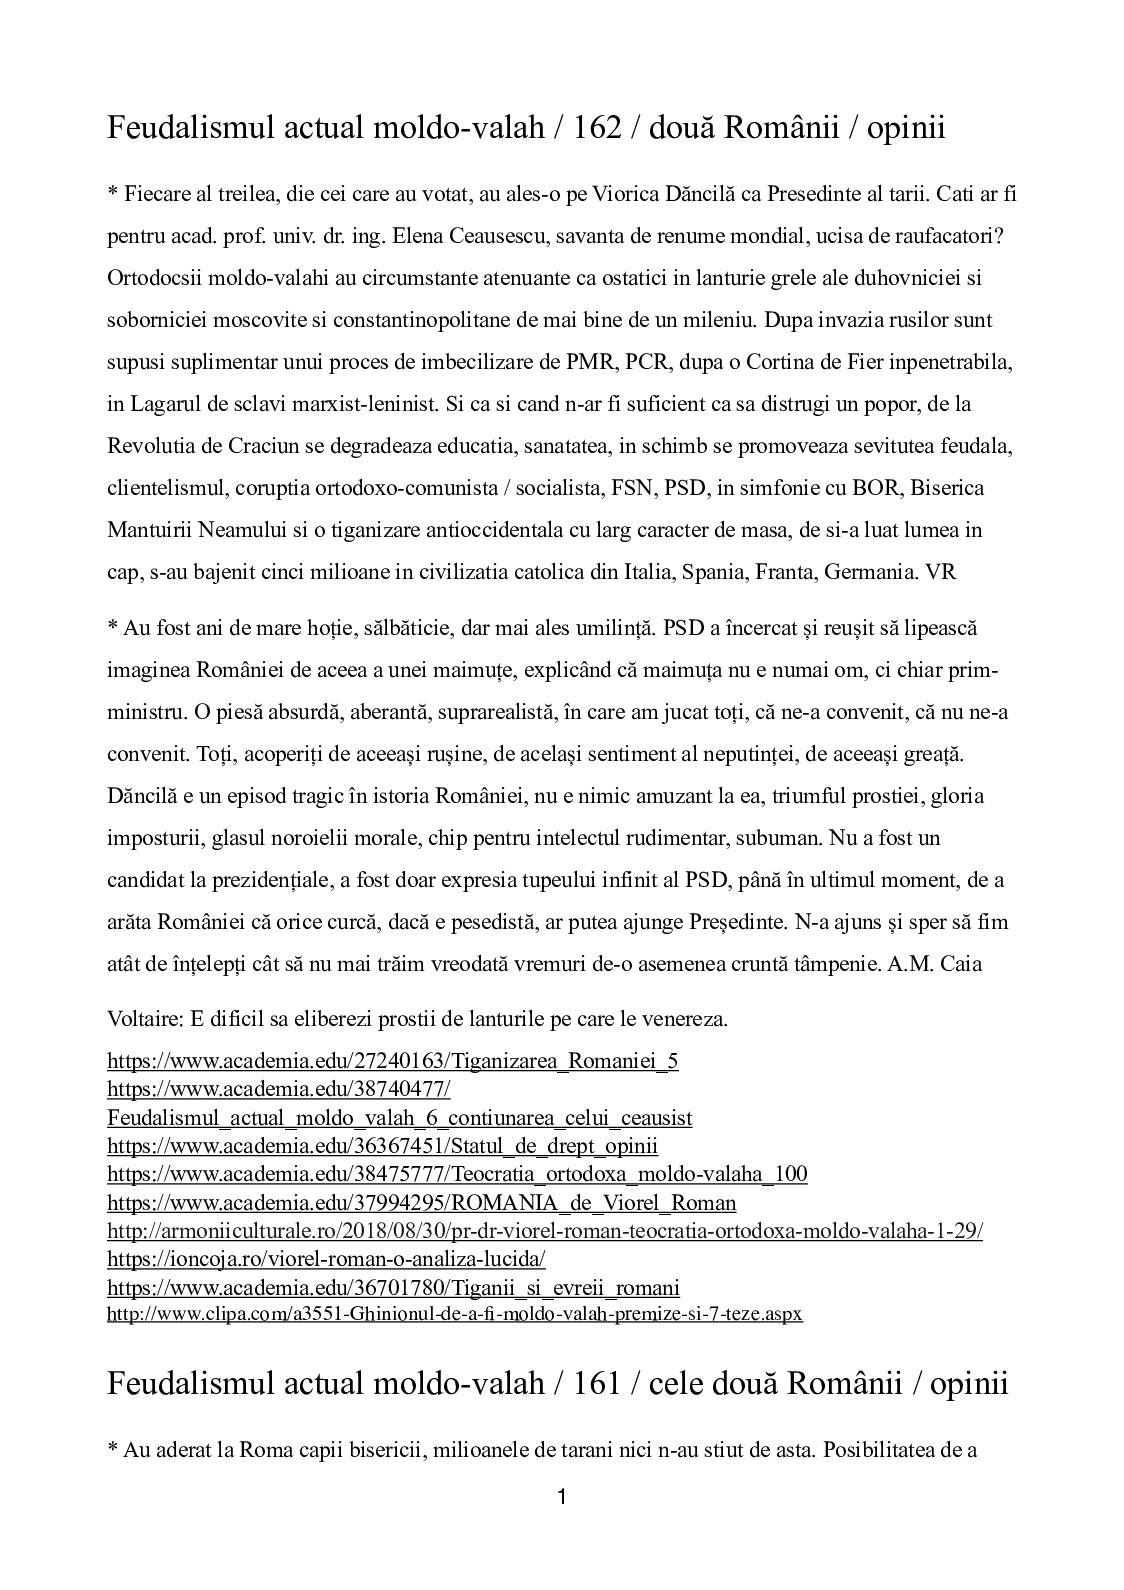 Profitul Agricol nr. 11, din 25 martie by Profitul Agricol - Issuu